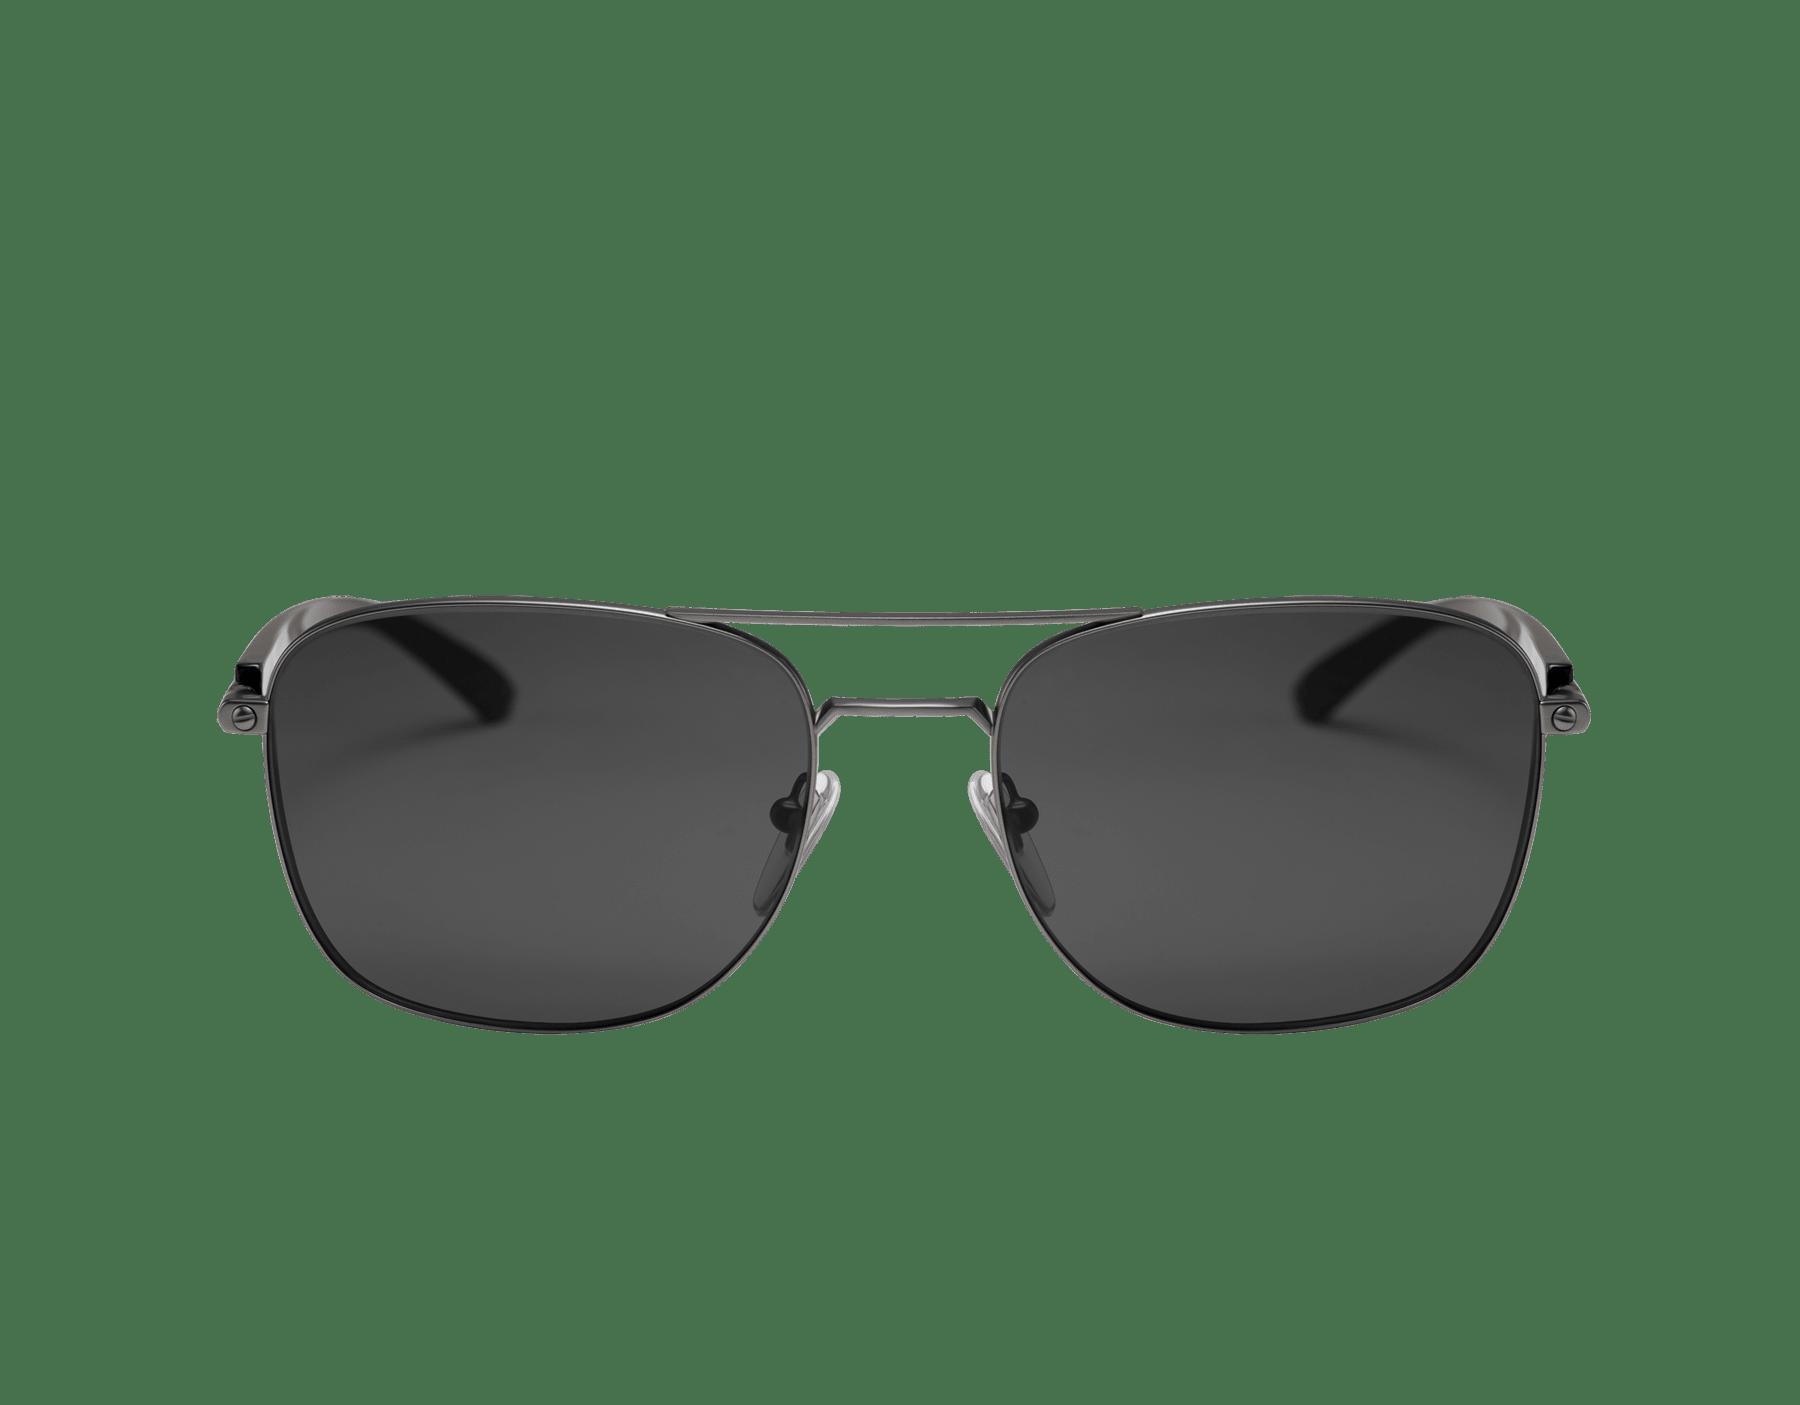 BVLGARI BVLGARI rectangular metal sunglasses with metal double bridge and carbon fiber arms. 903911 image 2